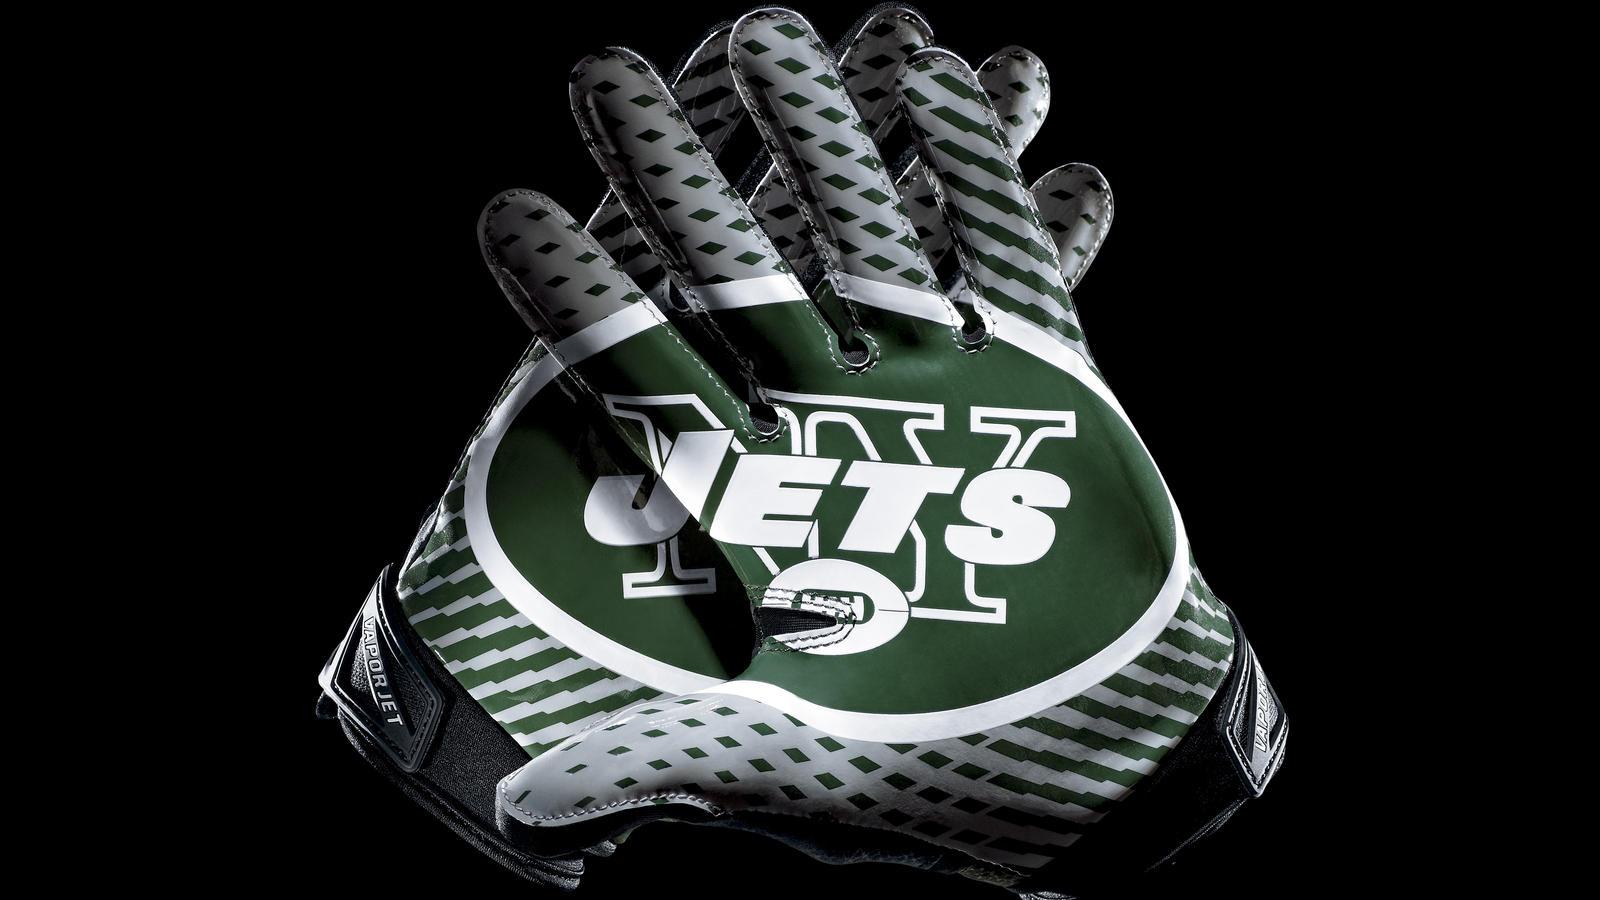 New York Jets 2012 Nike Football Uniform Nike News